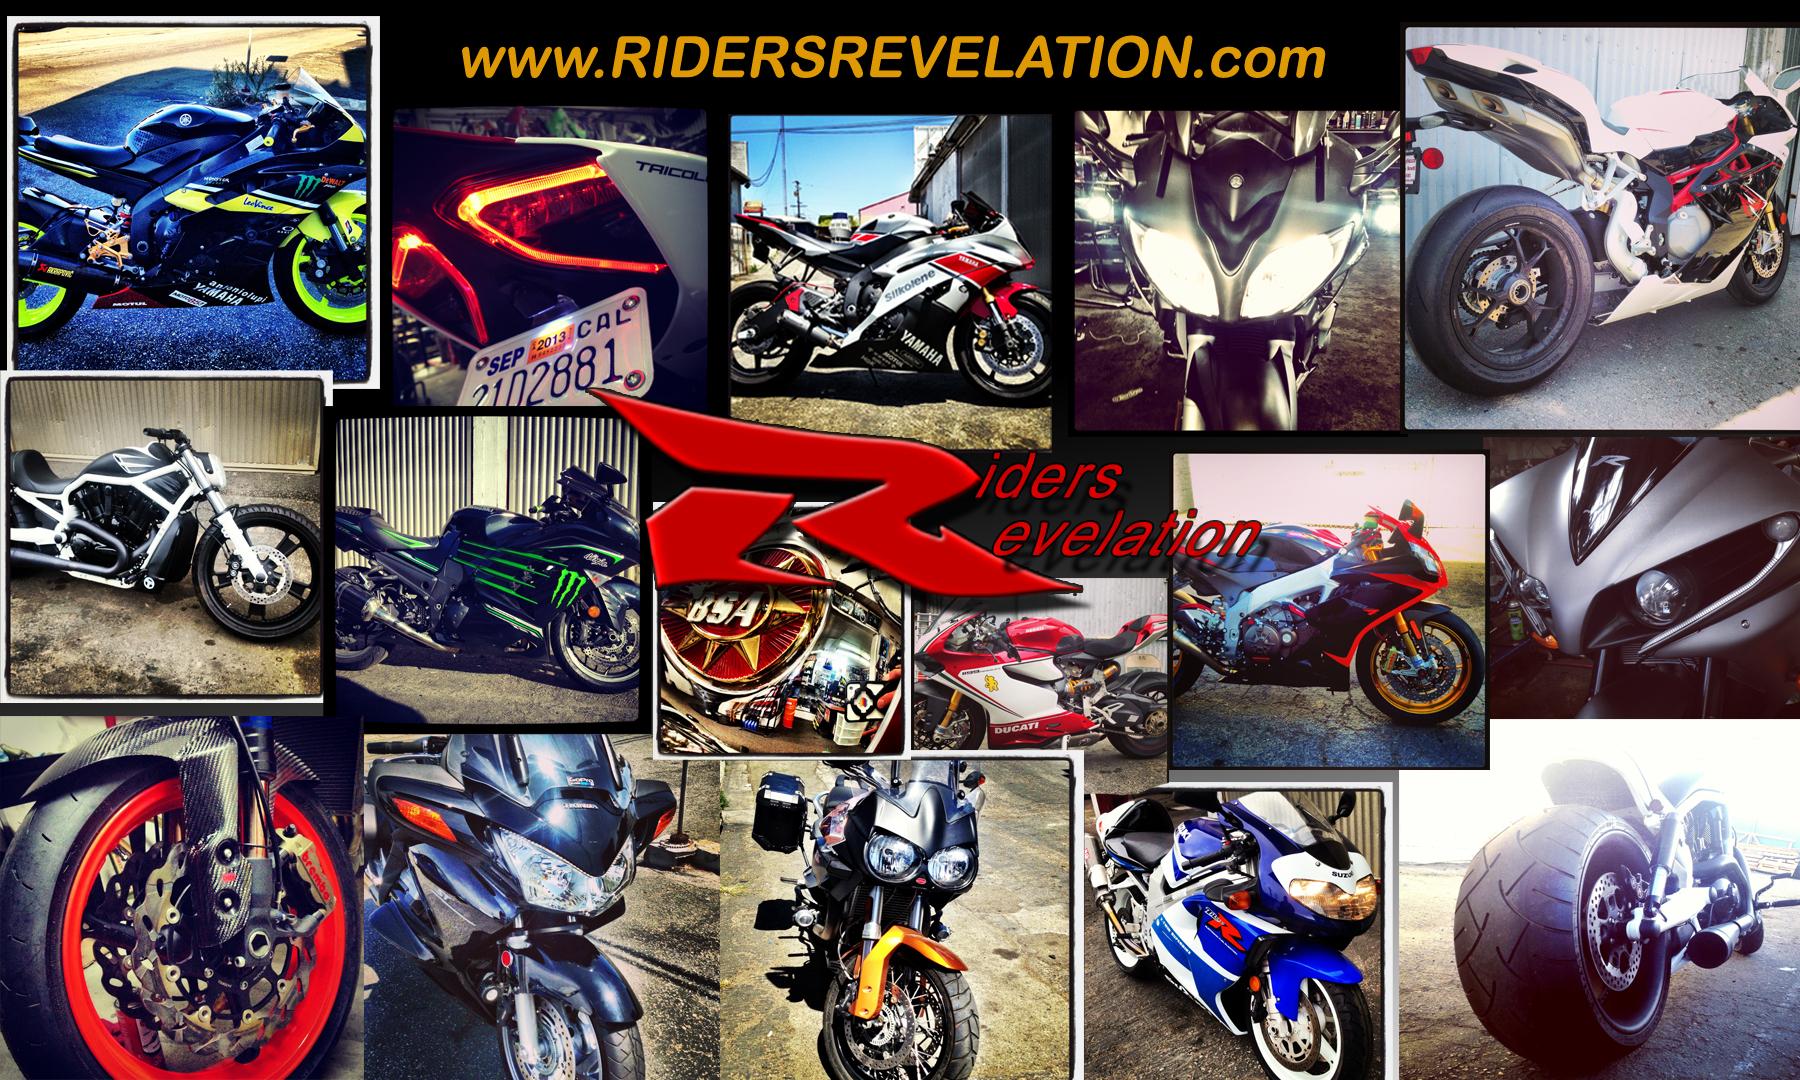 Riders Revelation